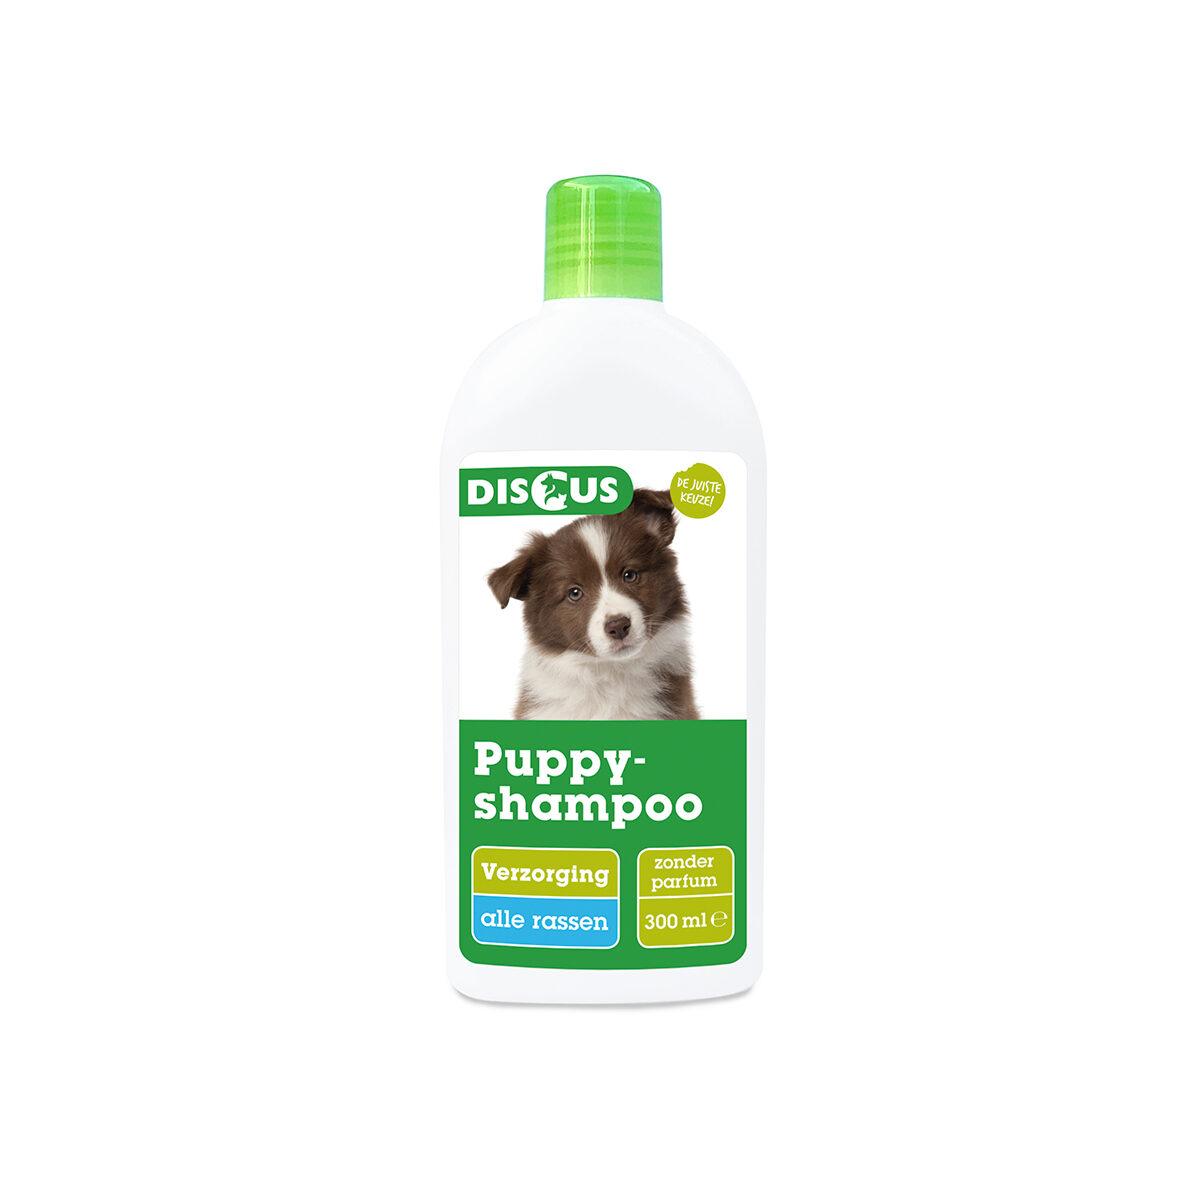 Discus Puppy Shampoo 300 ml